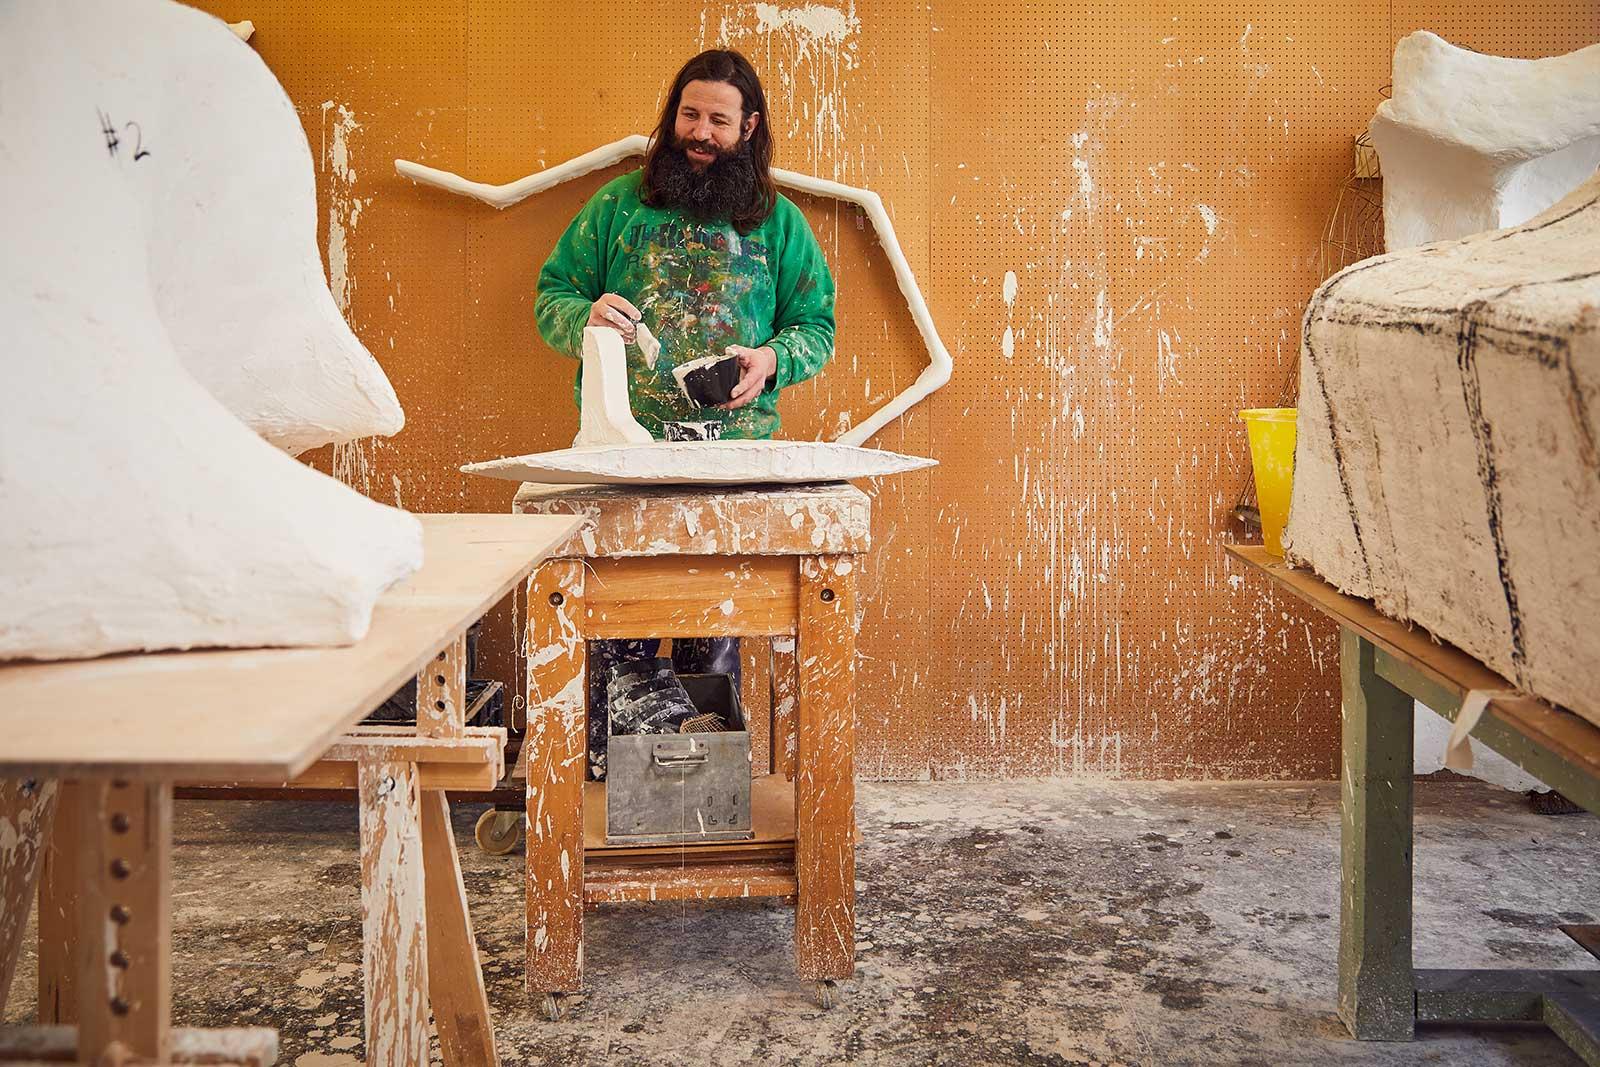 Desmond in his studio